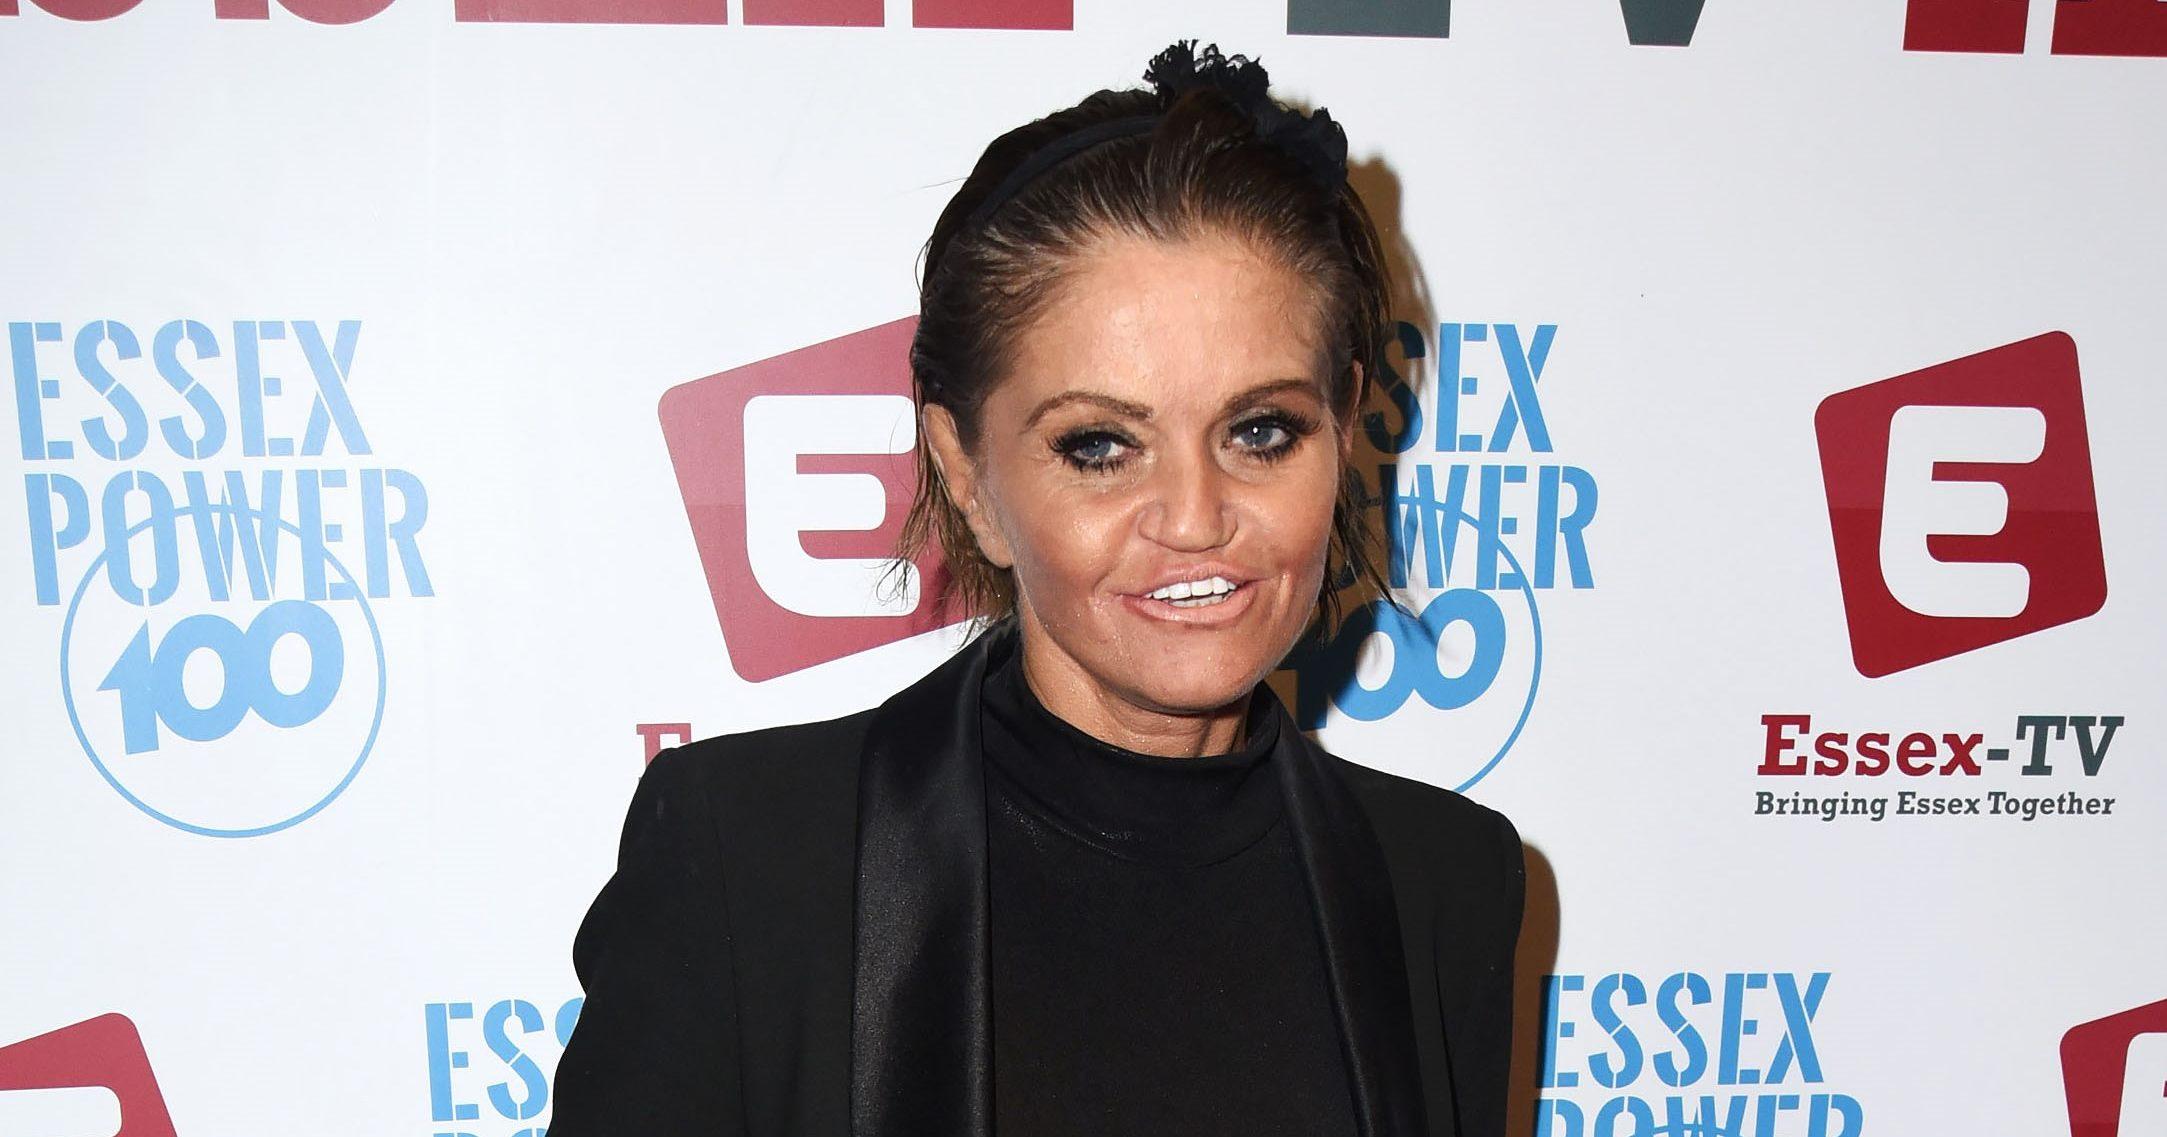 Danniella Westbrook thinks Ross Kemp helped save her life on EastEnders set